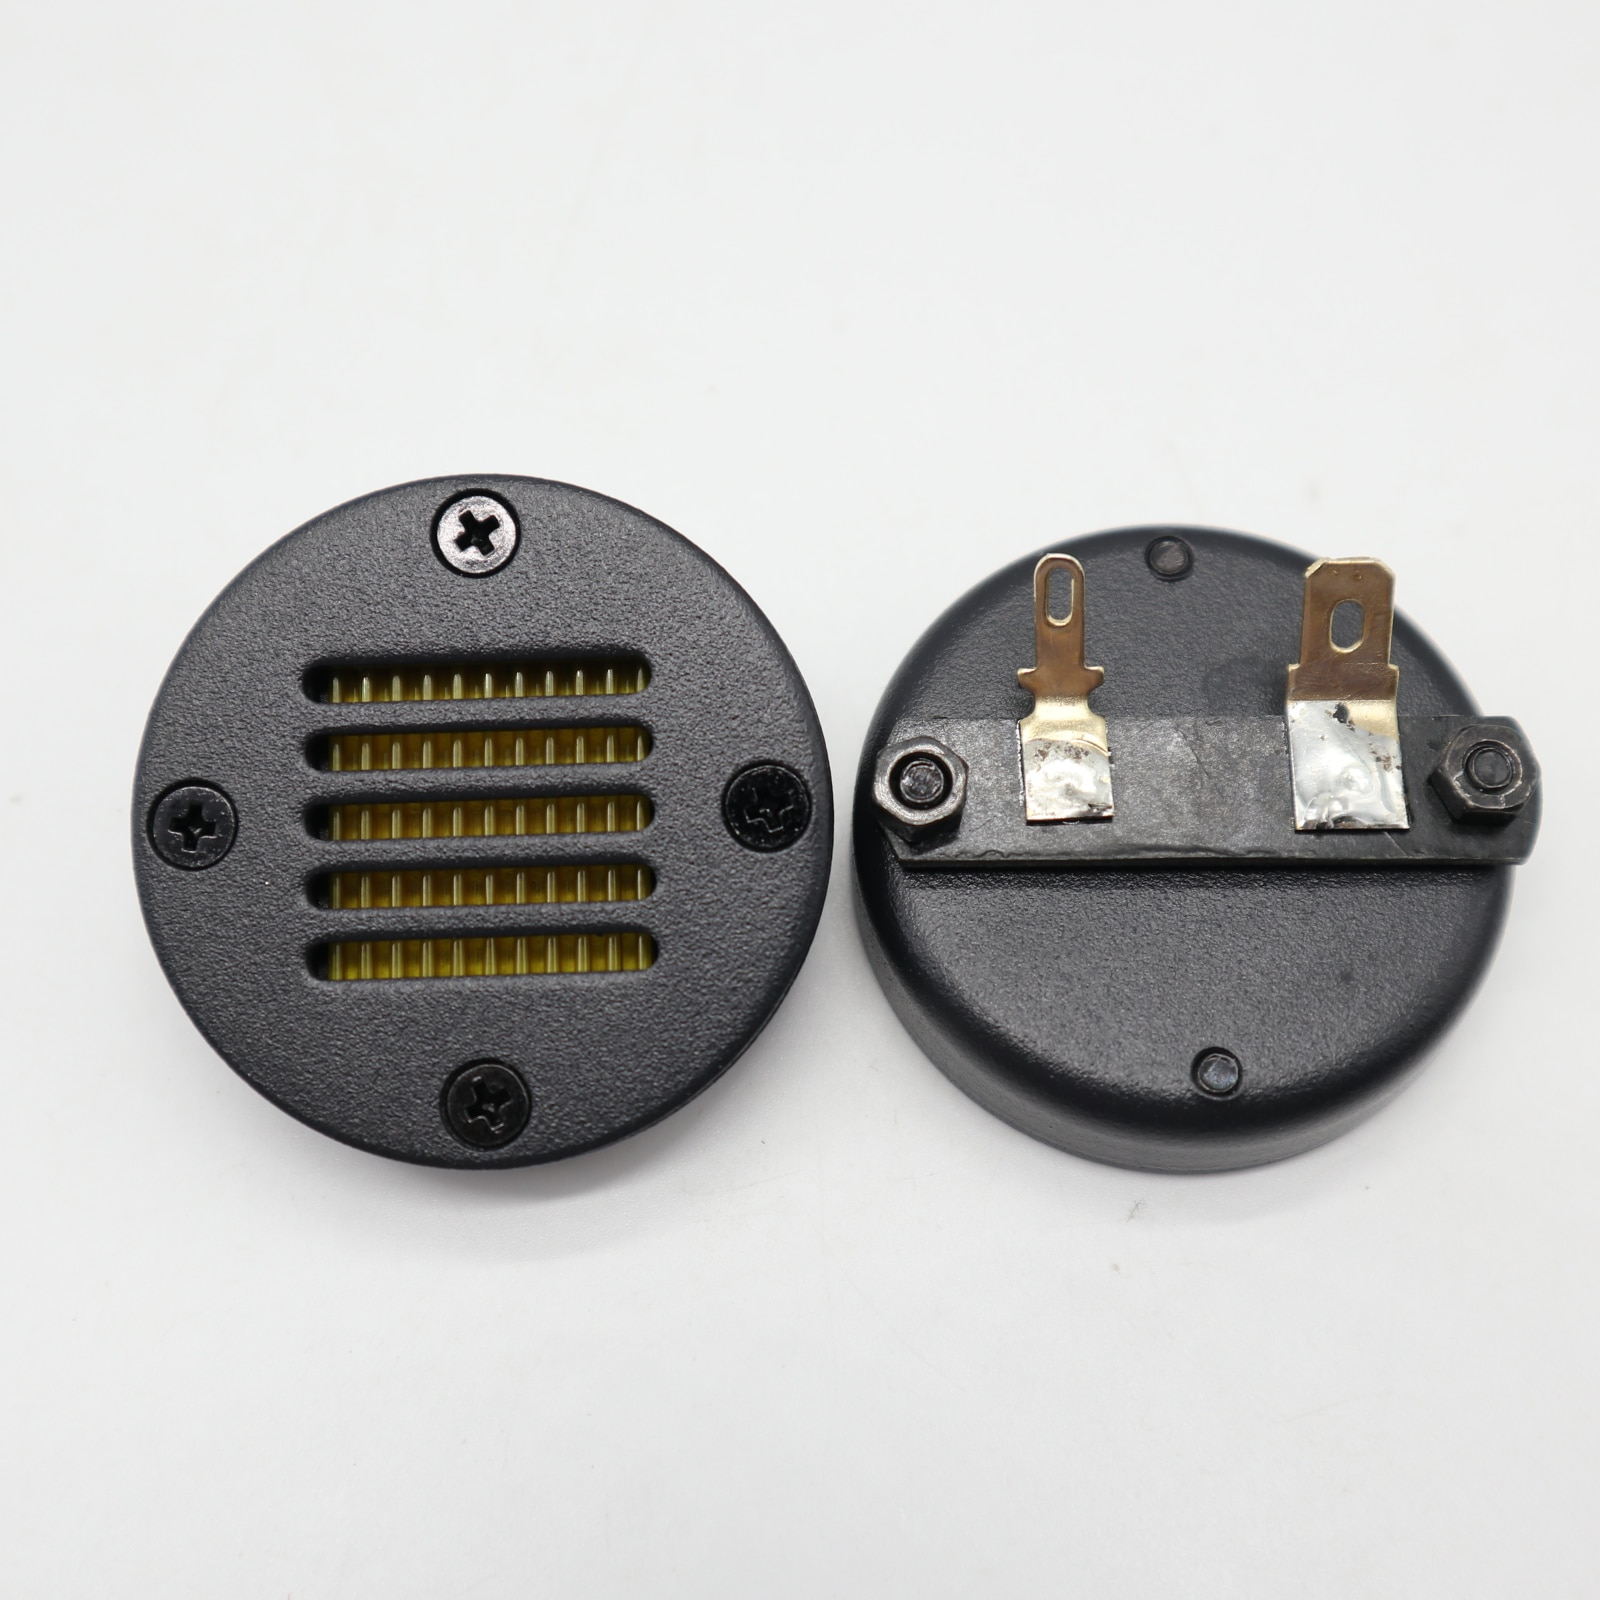 1 Pair (2pcs) High quality planar transducer AMT ribbon tweeter raw speaker driver Air Motion Transformer Car tweeter speakers